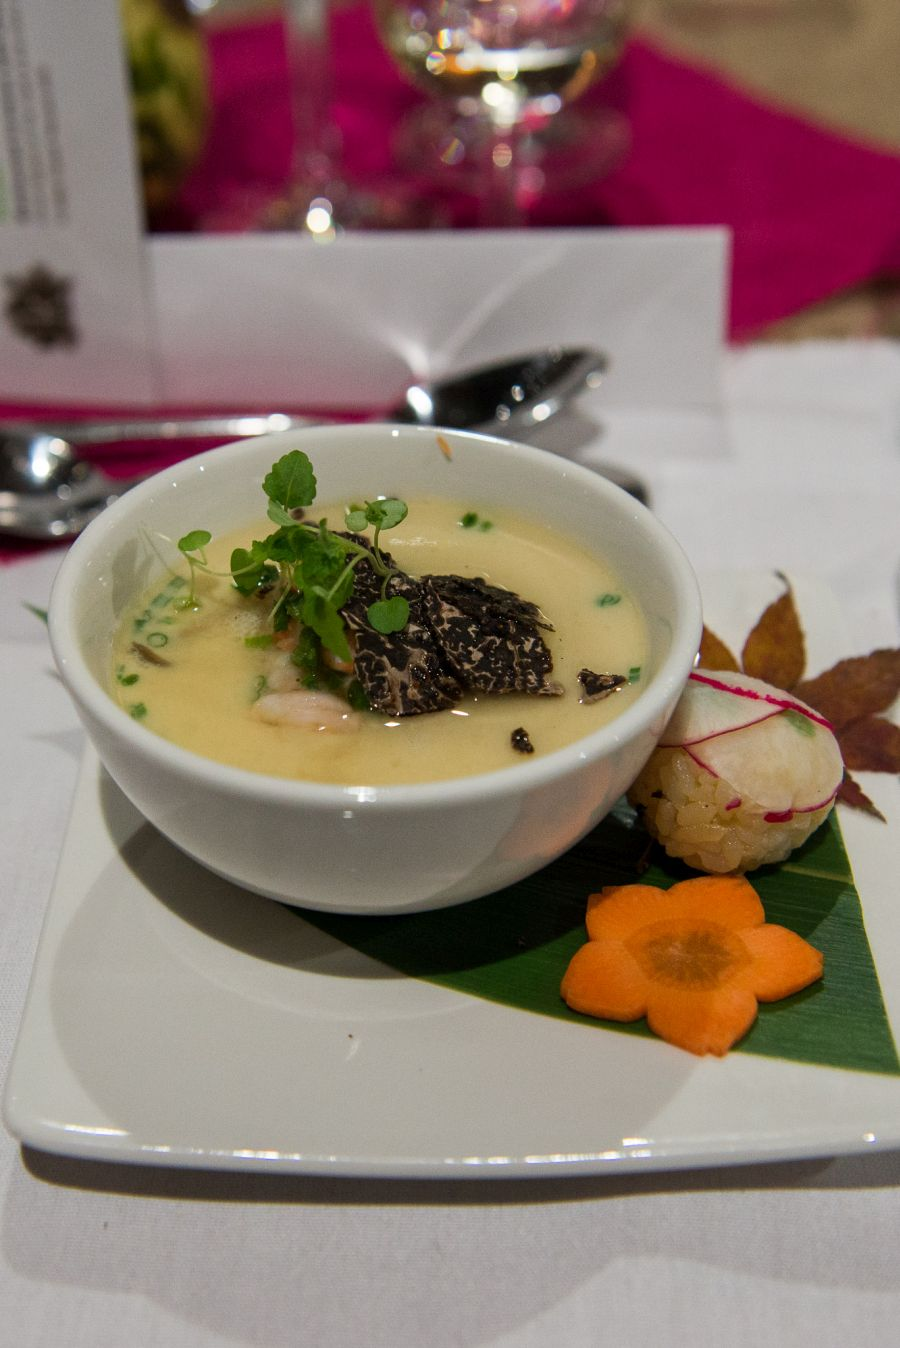 Chawan-mushi with marron and truffle by Shinichi Maeda, Sake Restaurant & Bar Brisbane